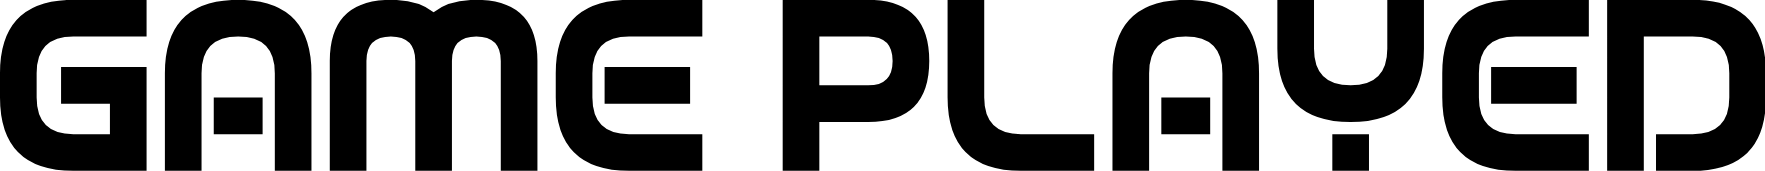 Nintendo Fonts Fontspace